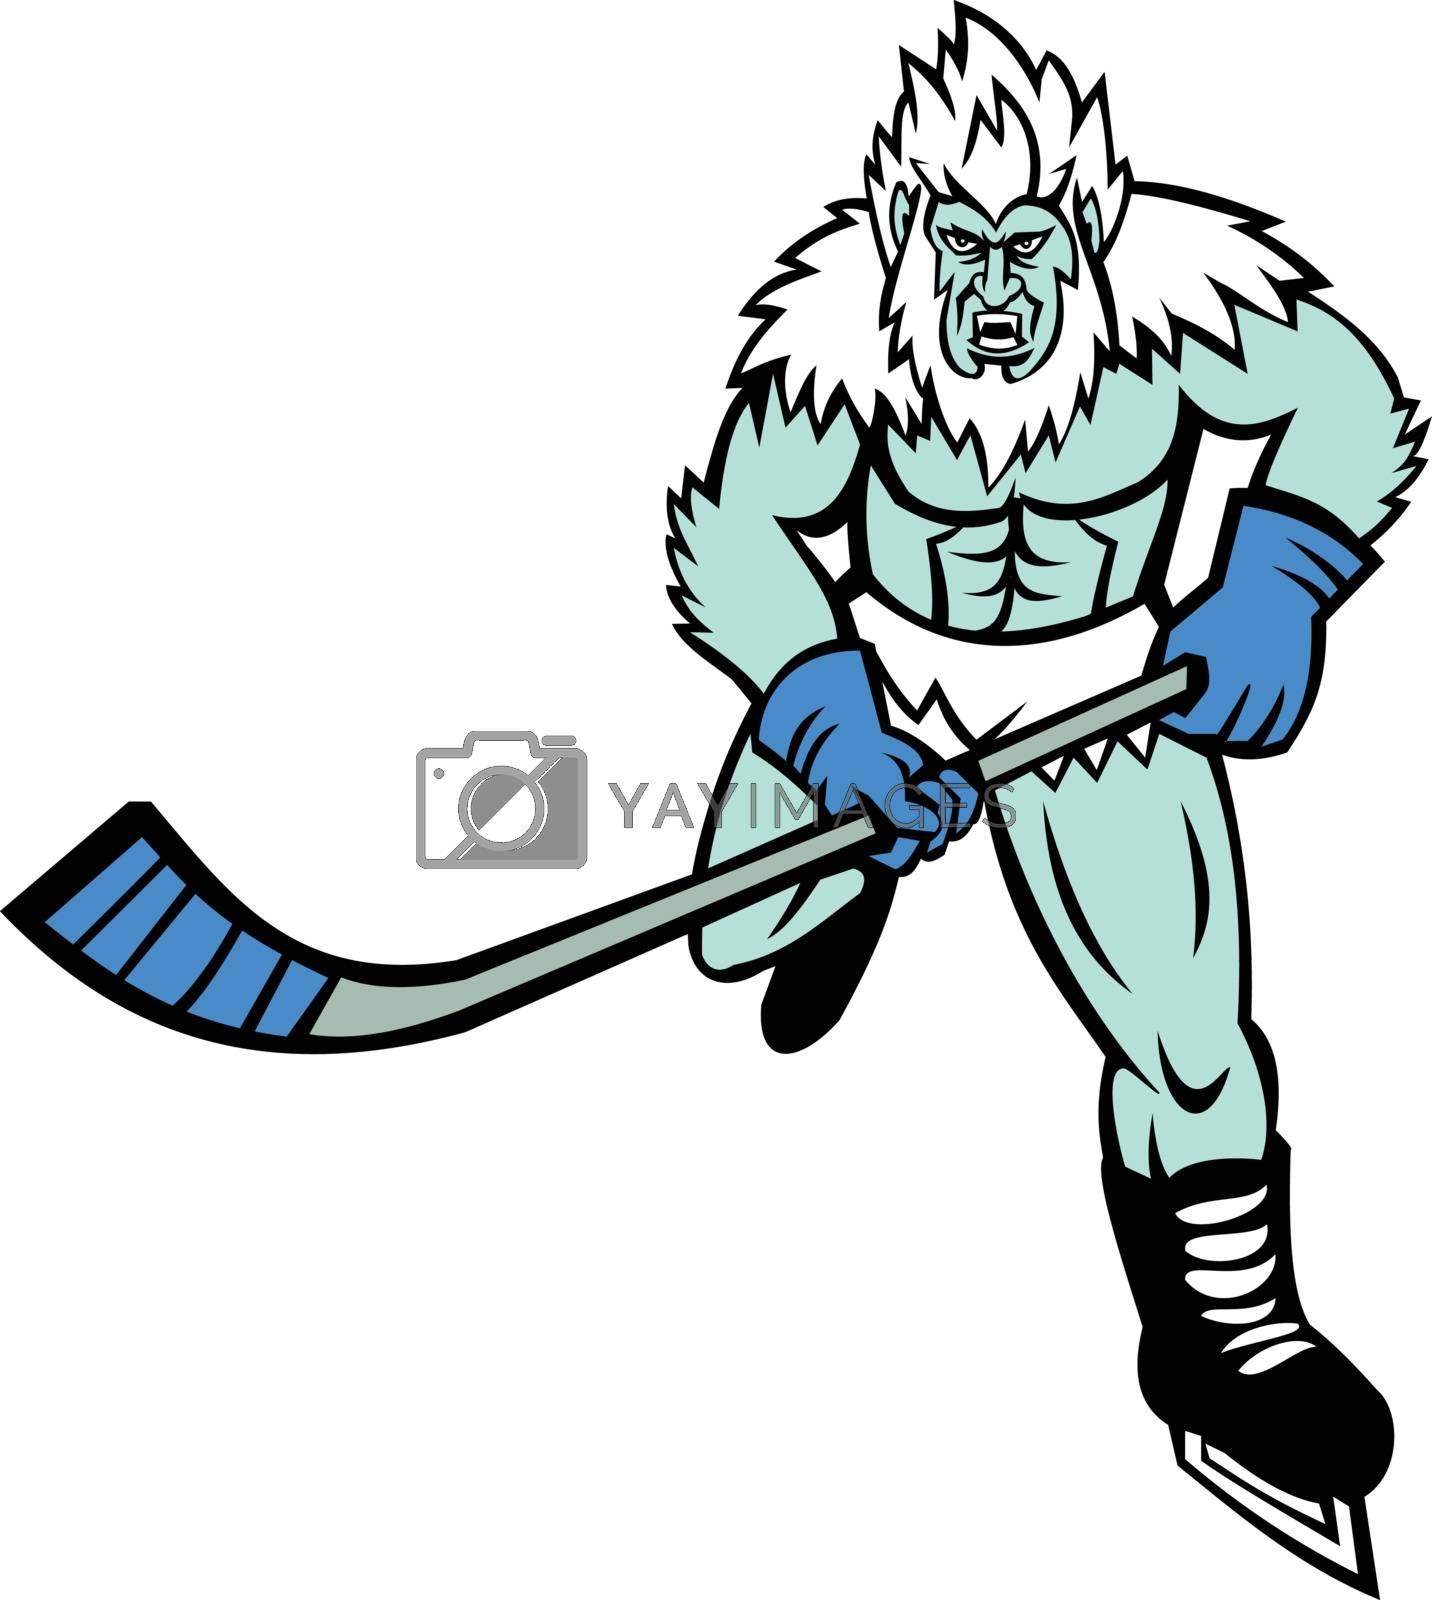 Abominable Snowman Ice Hockey Player Mascot by patrimonio